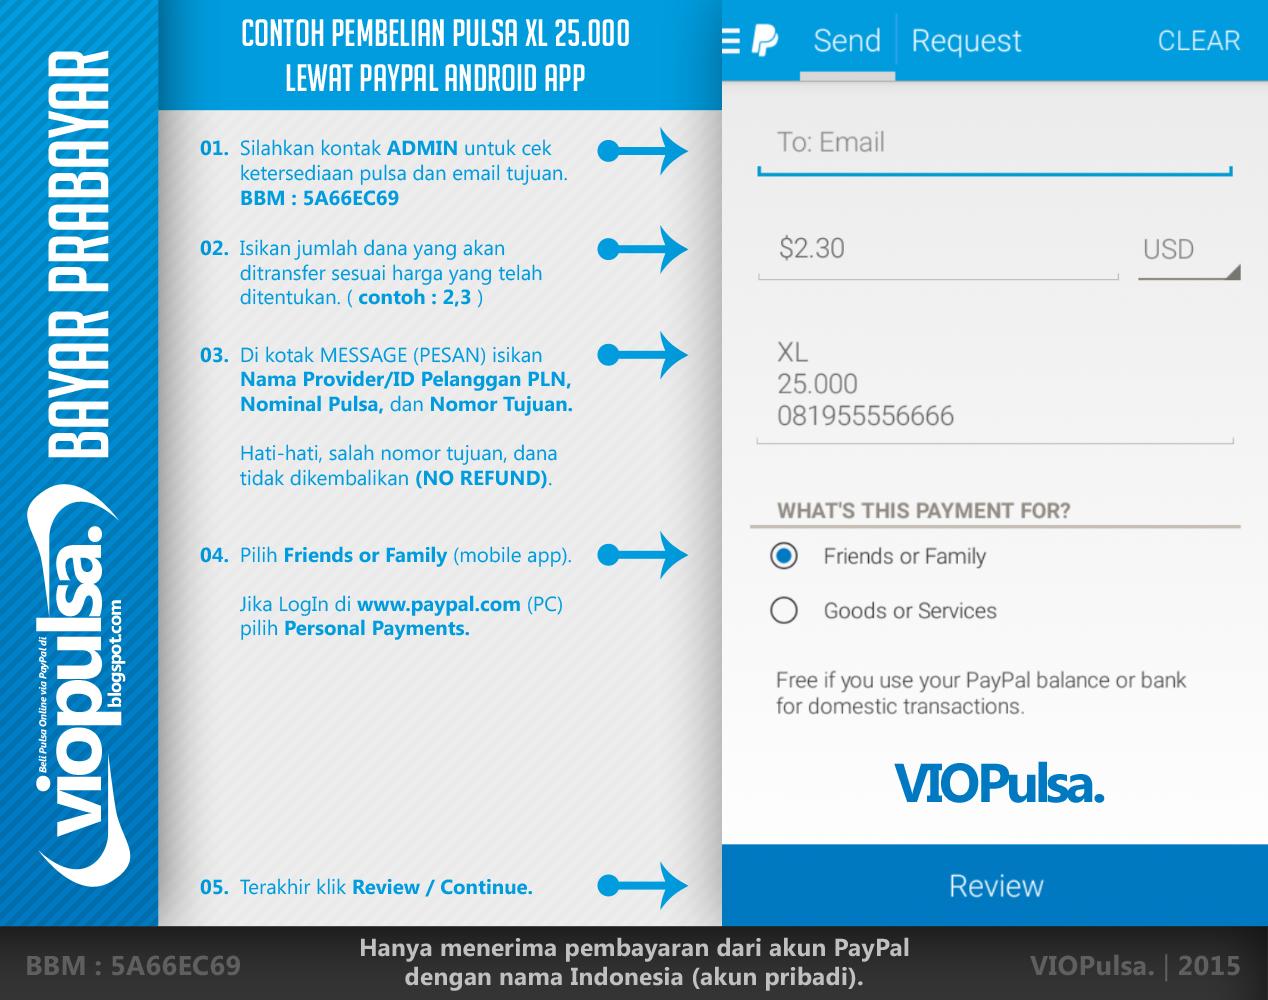 Selamat Datang Di Viopulsa Beli Pulsa Via Dollar Paypal Di Viopulsa